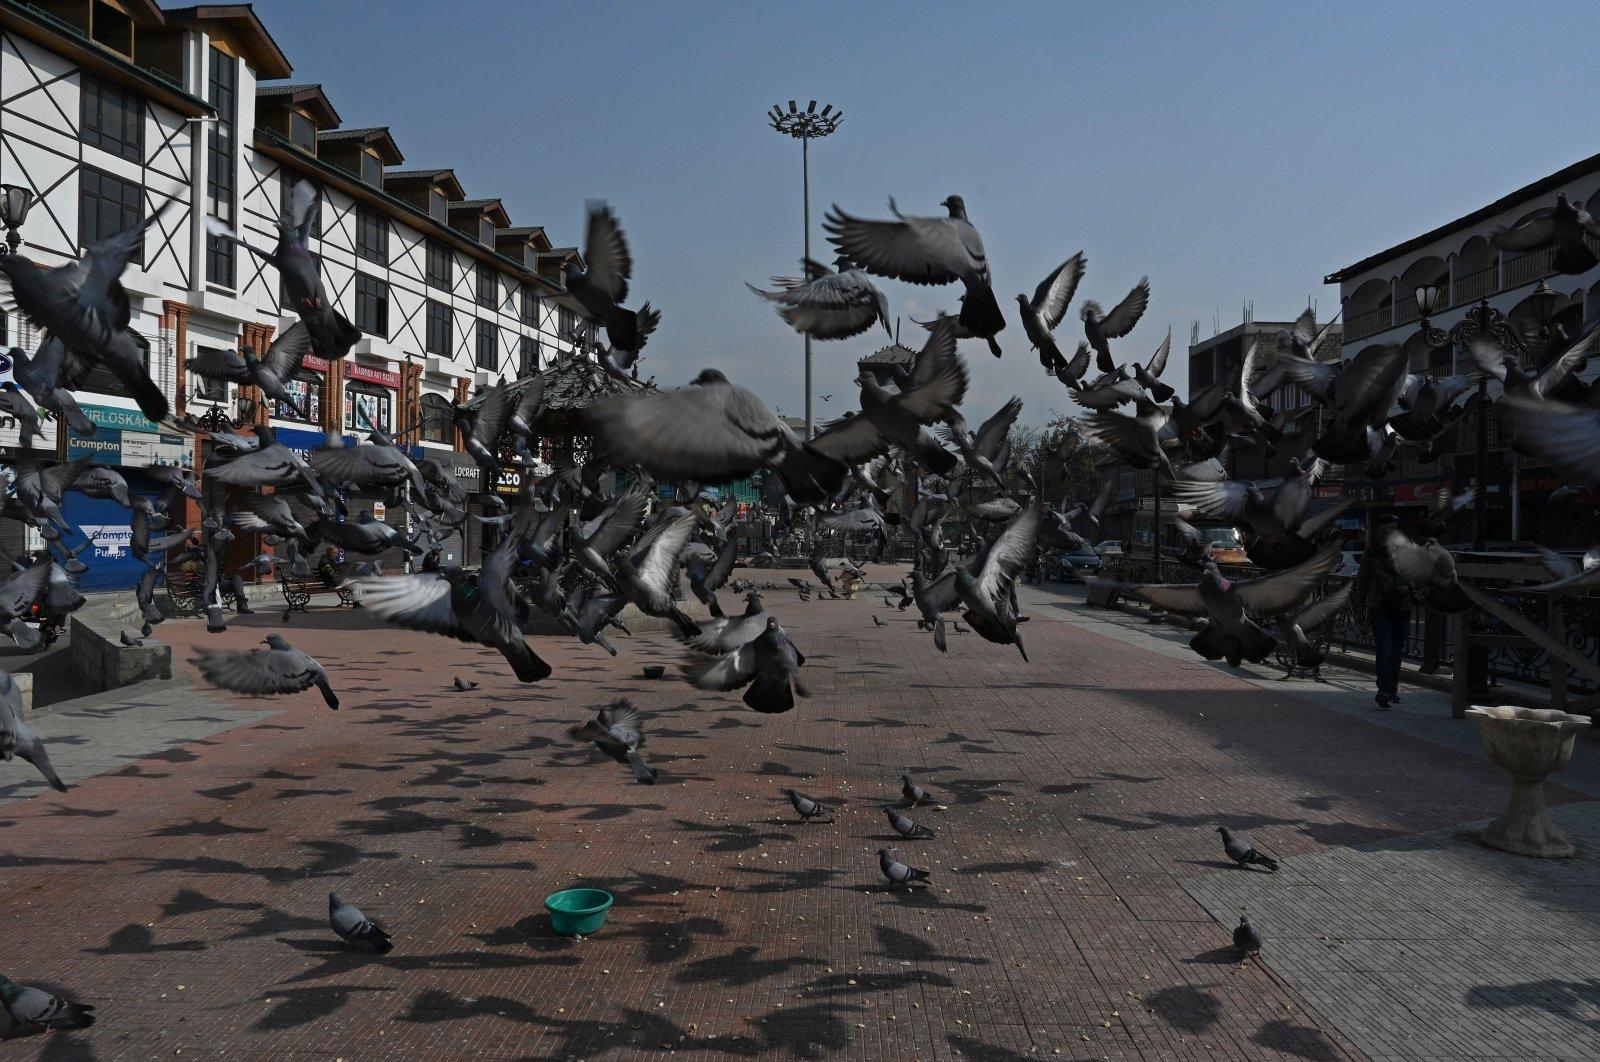 Pigeons take flight in a square in Srinagar, Kashmir, Oct. 31, 2020. (AFP Photo)